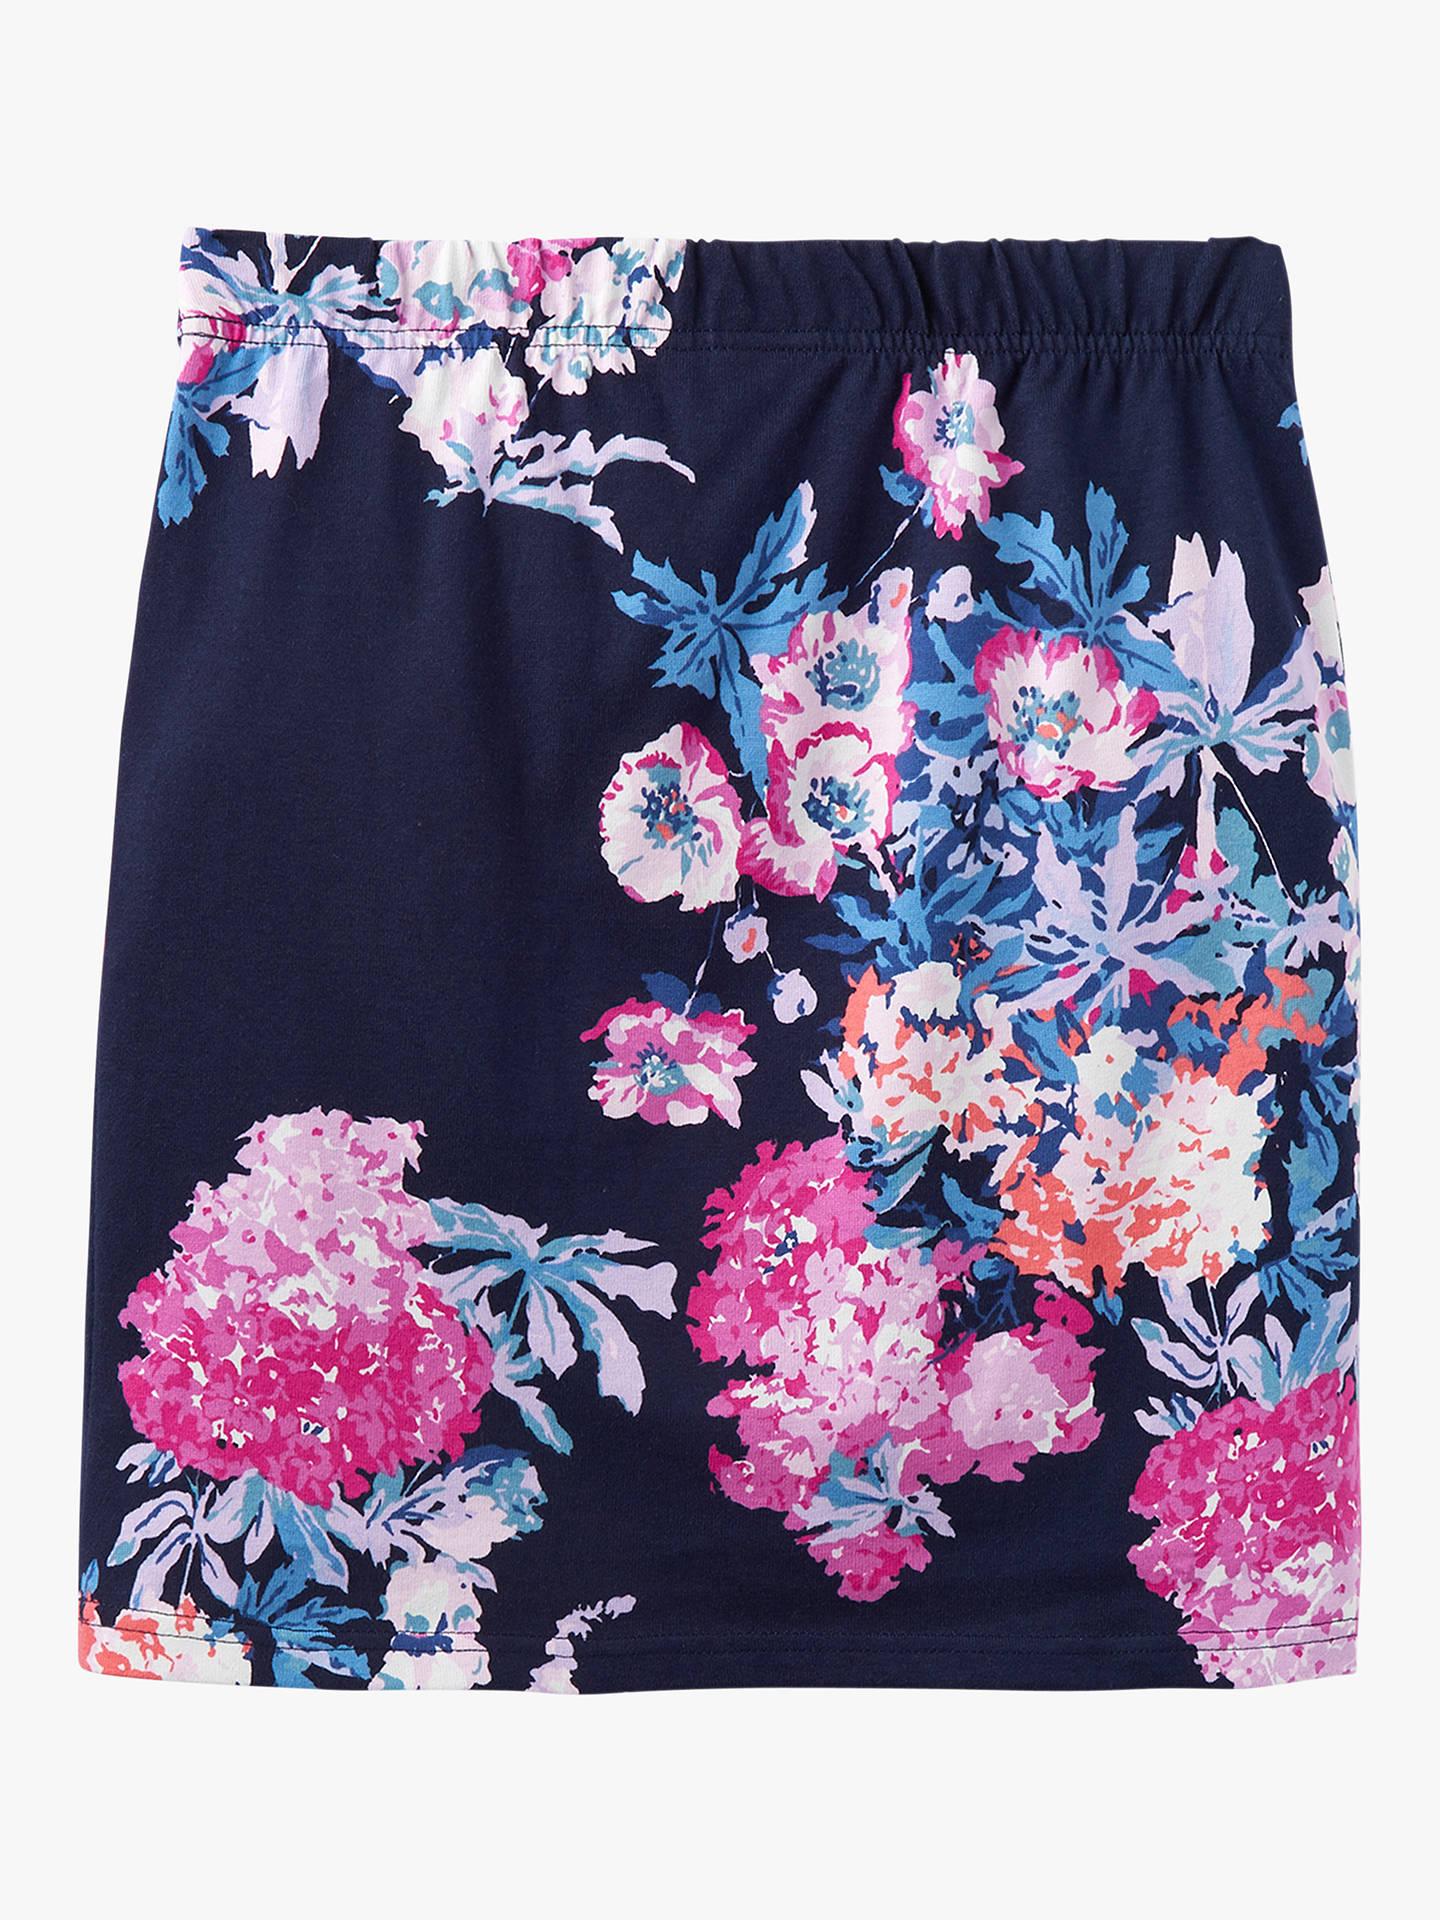 19d3cd29cf ... Buy Joules Portia Printed Pencil Skirt, Navy Floral, 6 Online at  johnlewis.com ...